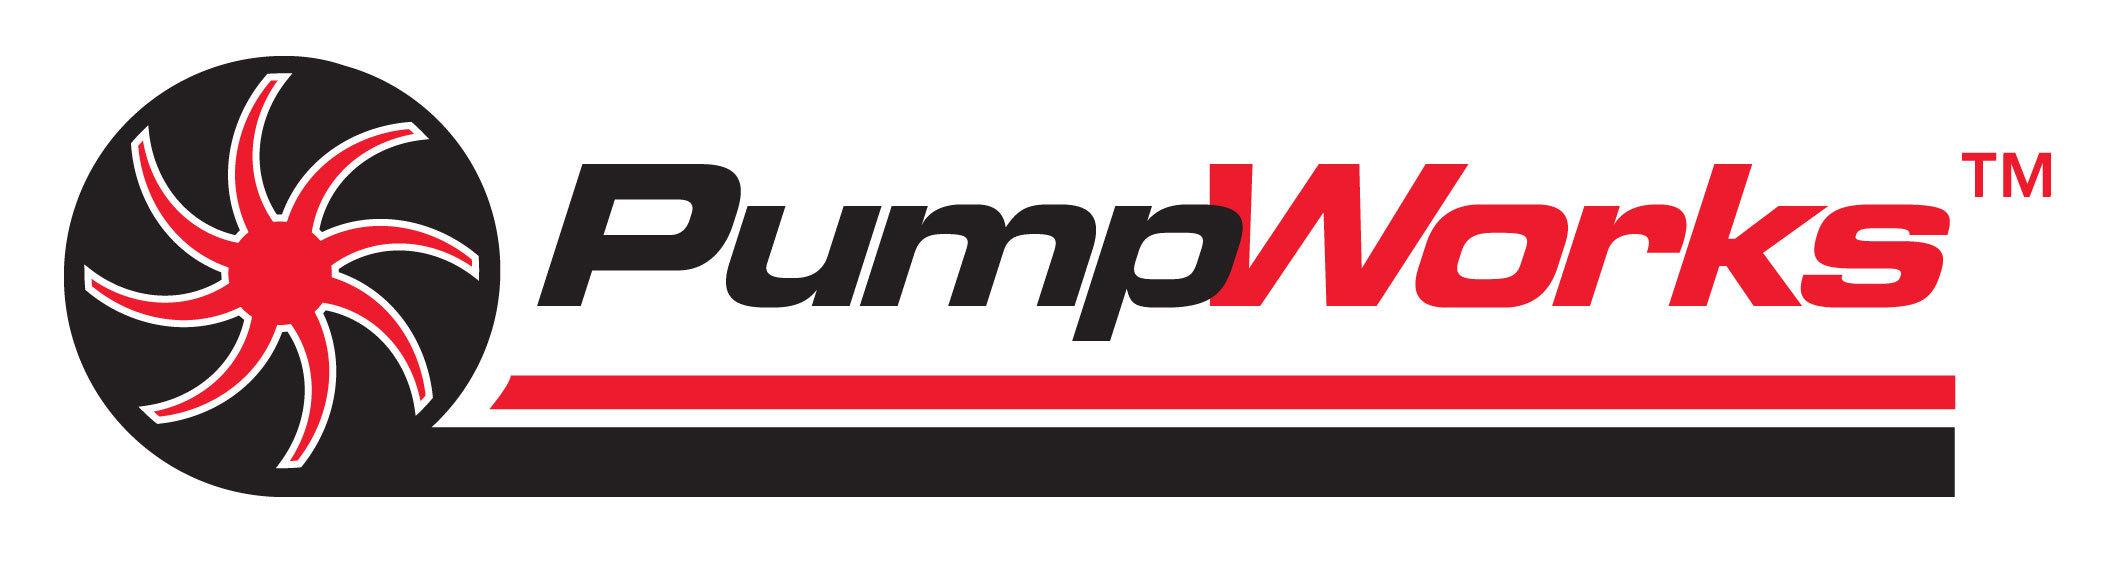 PumpWorks Unveils New PWA-SL – a Metallic Sealless ANSI Pump